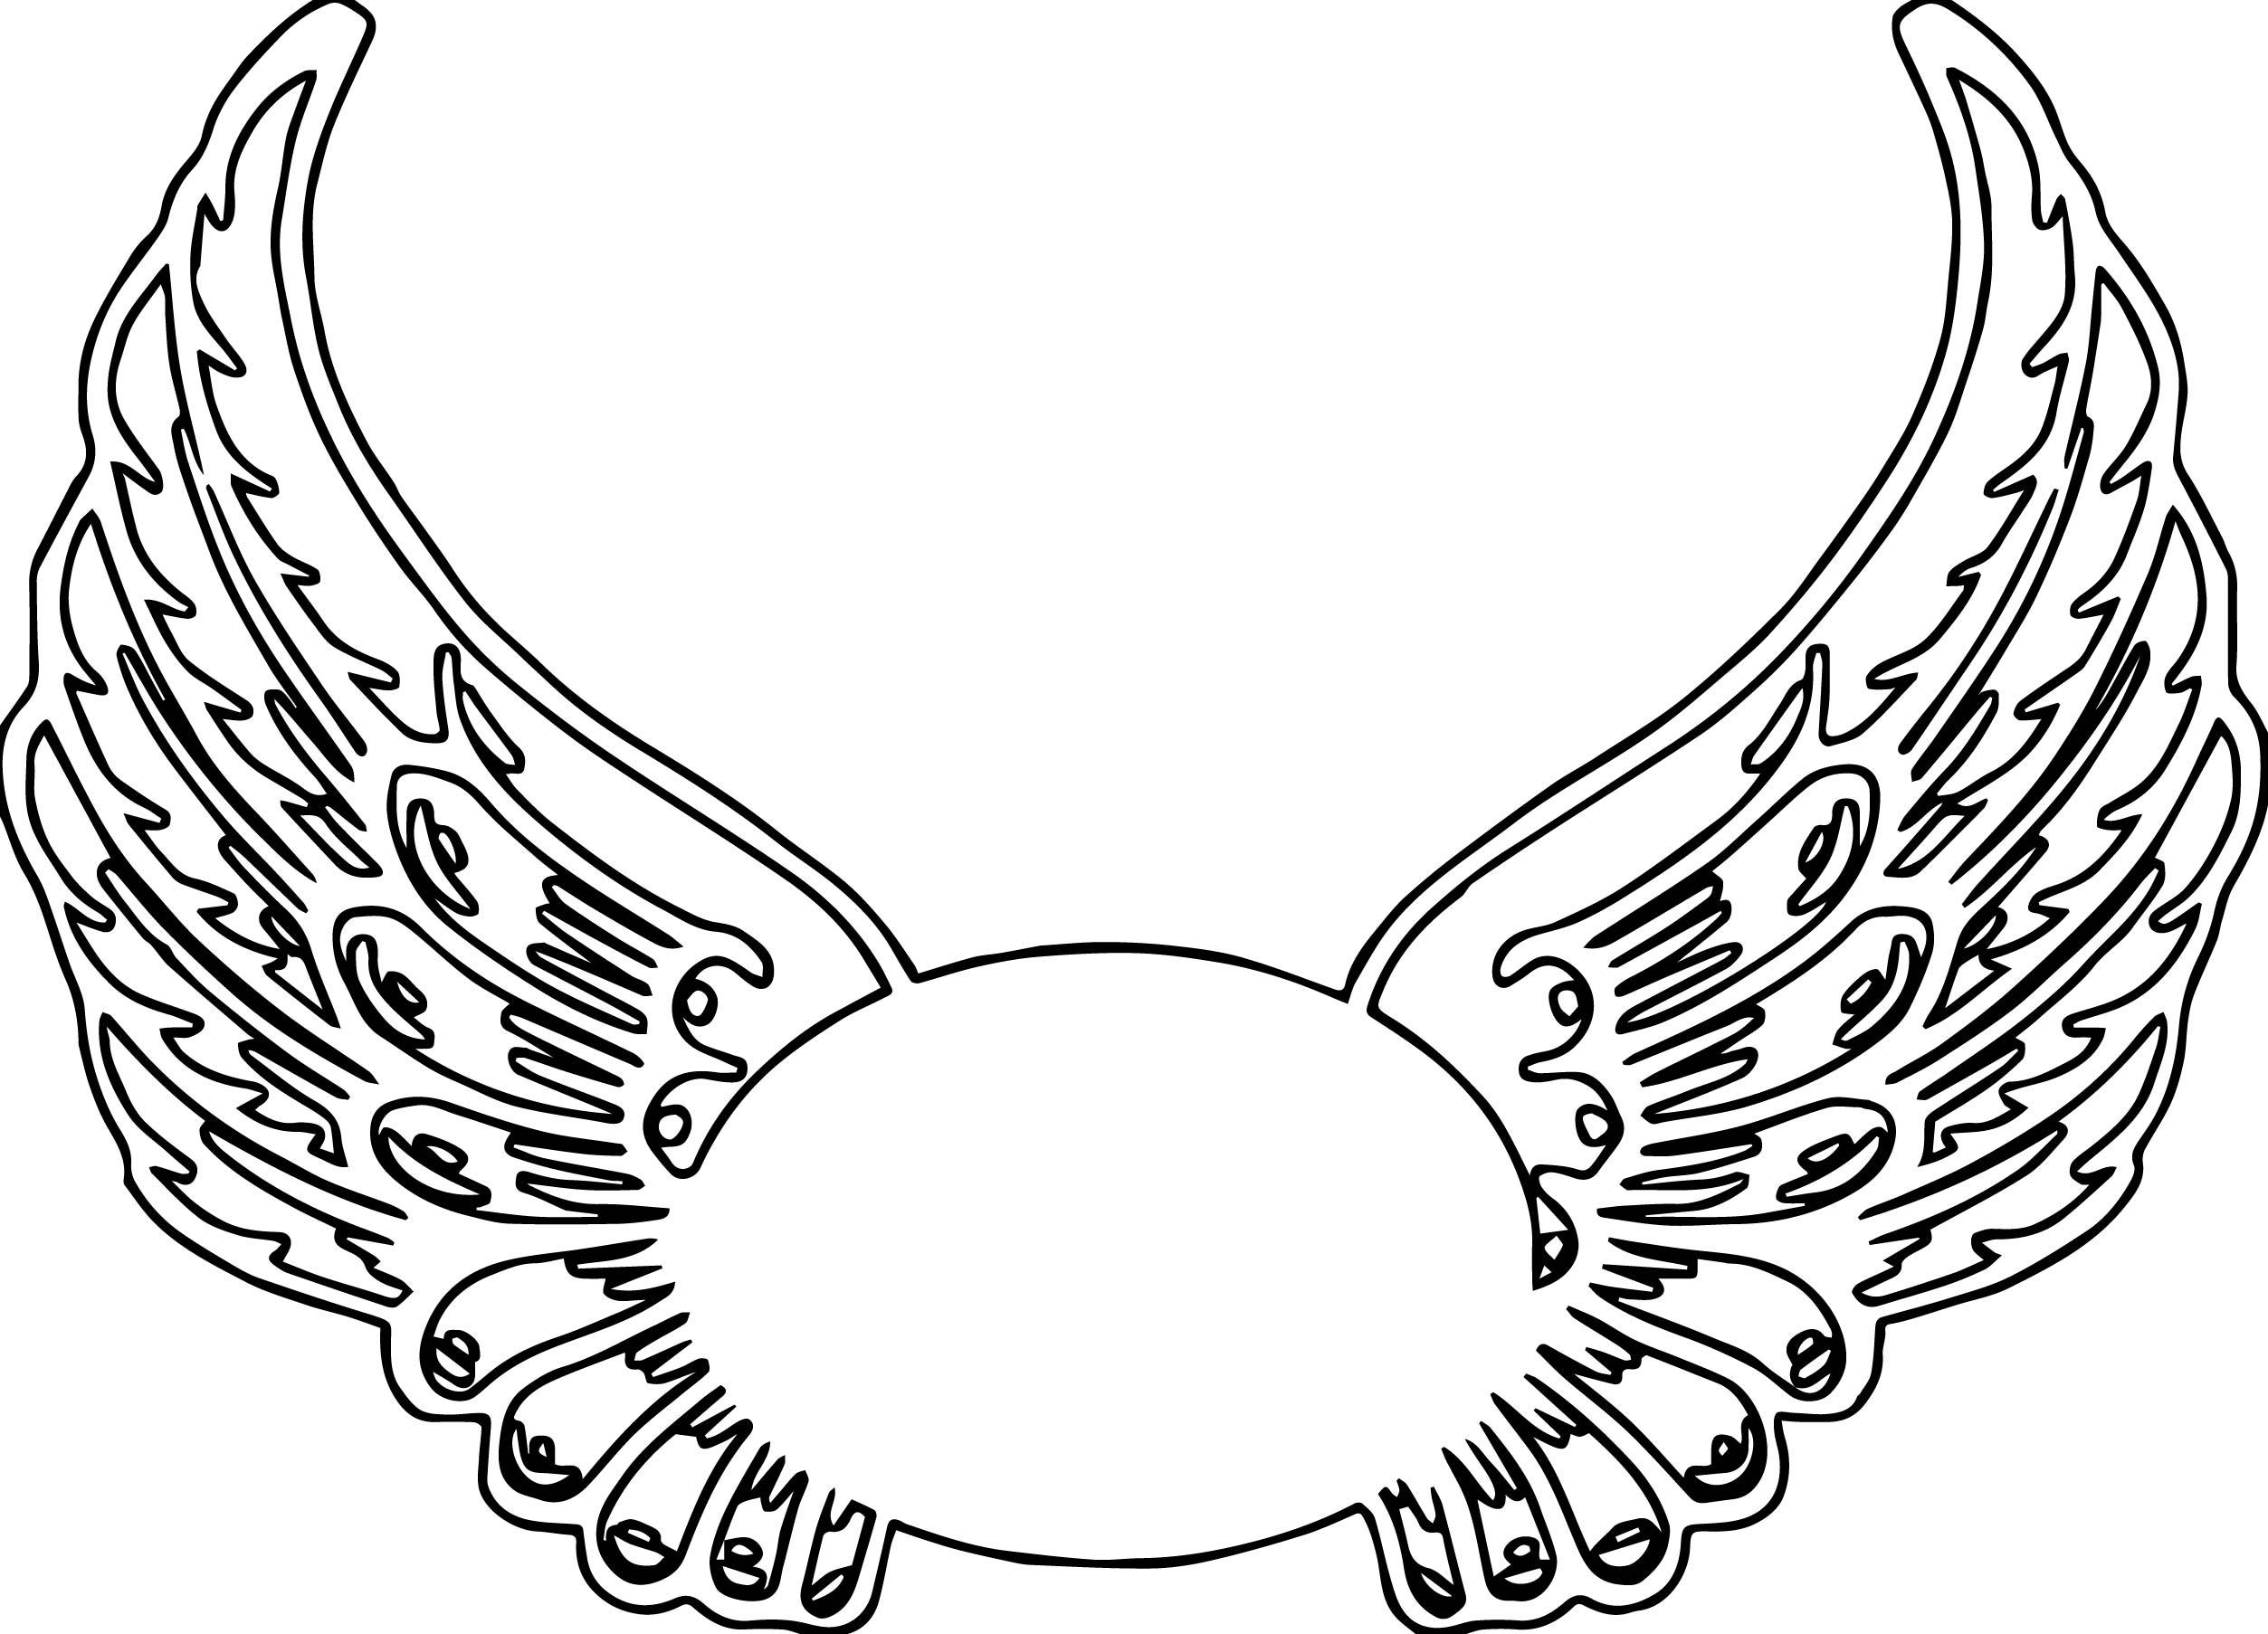 Angel Wings Coloring Page Printable